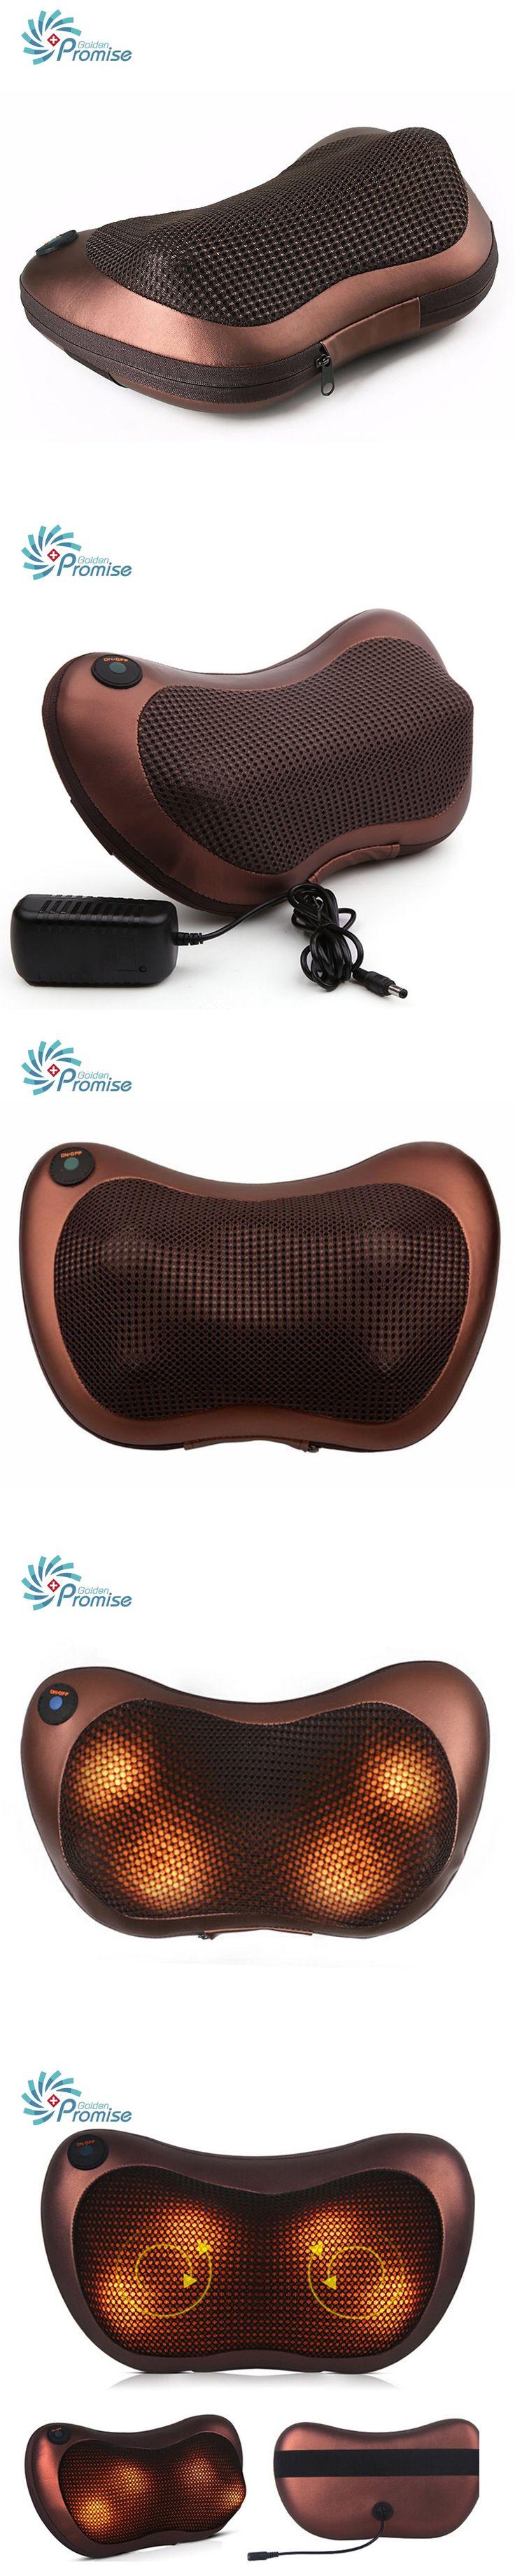 GPYOJA Home Car Dual-use Massage Pillow Electric Infrared Heating Kneading Cervical Neck Shoulder Back Body Spa Shiatsu Massager